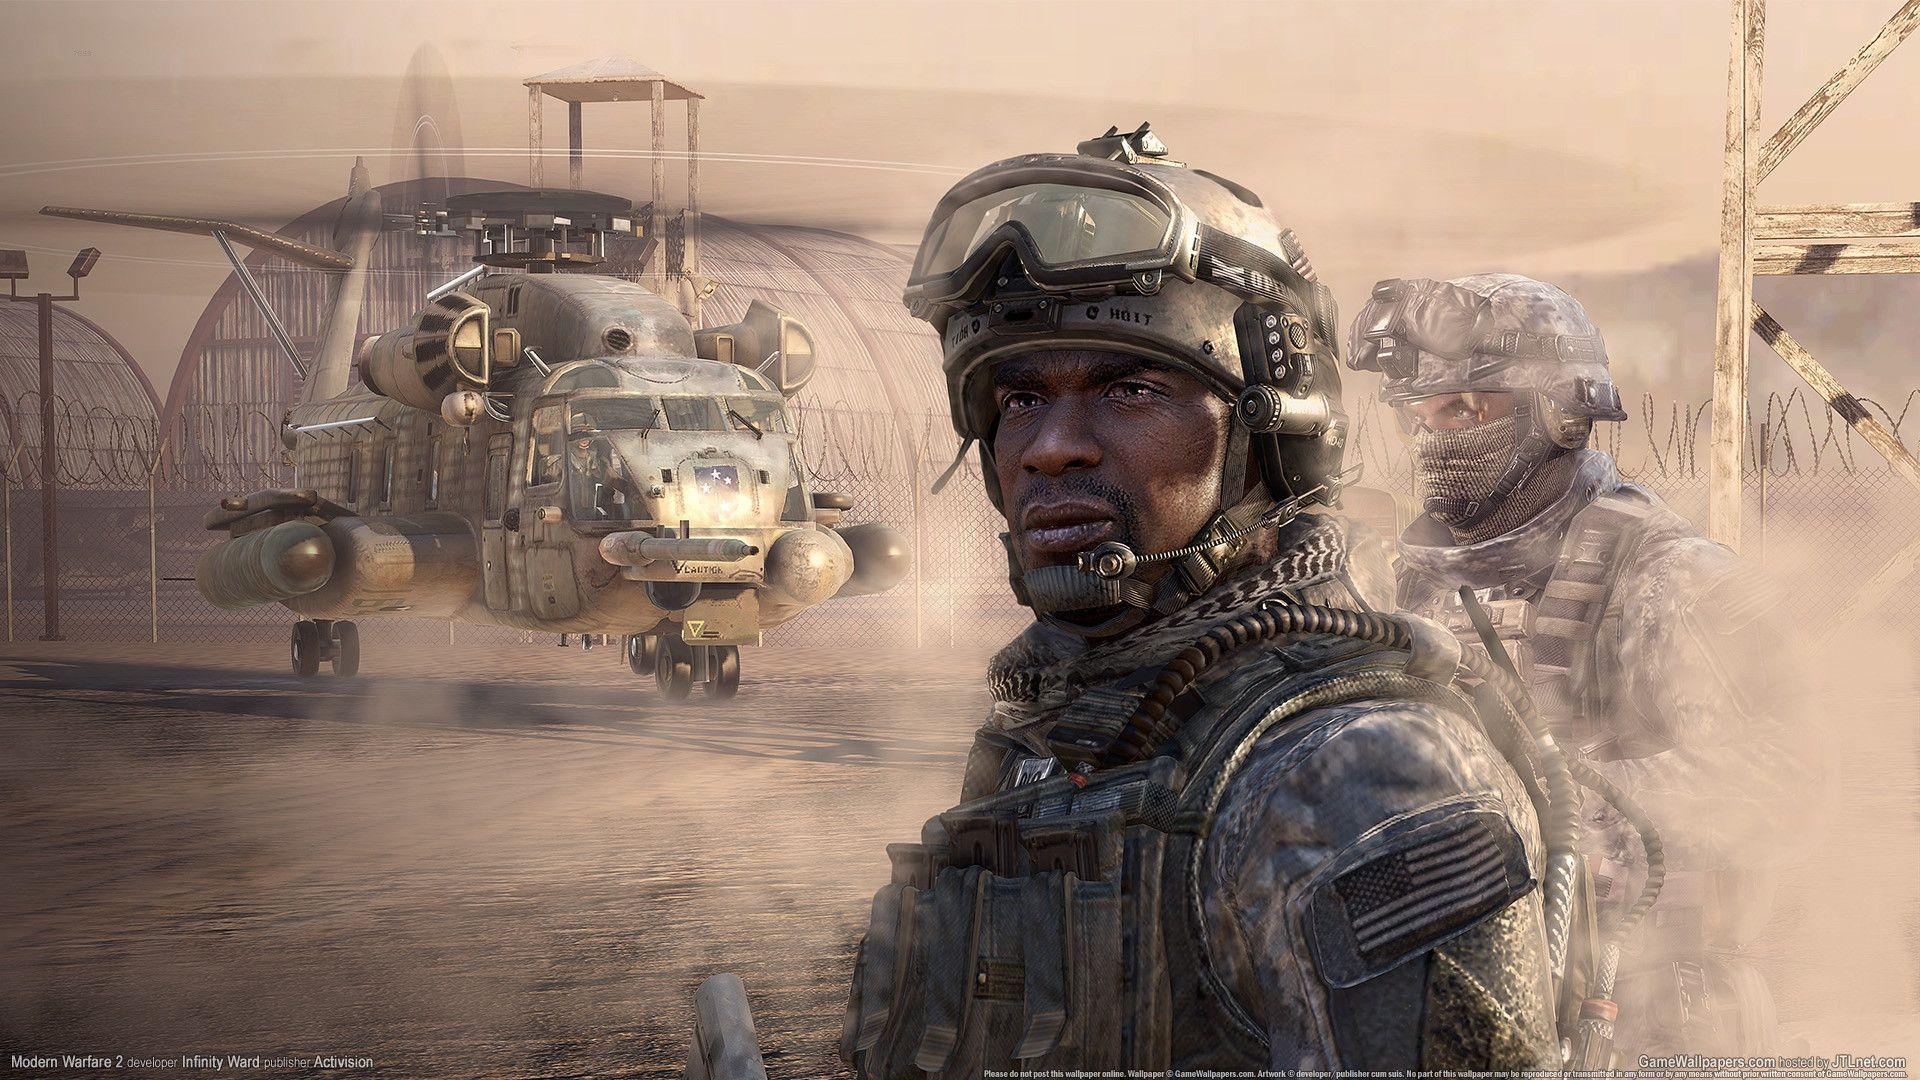 Modern Warfare Wallpapers - Wallpaper Cave